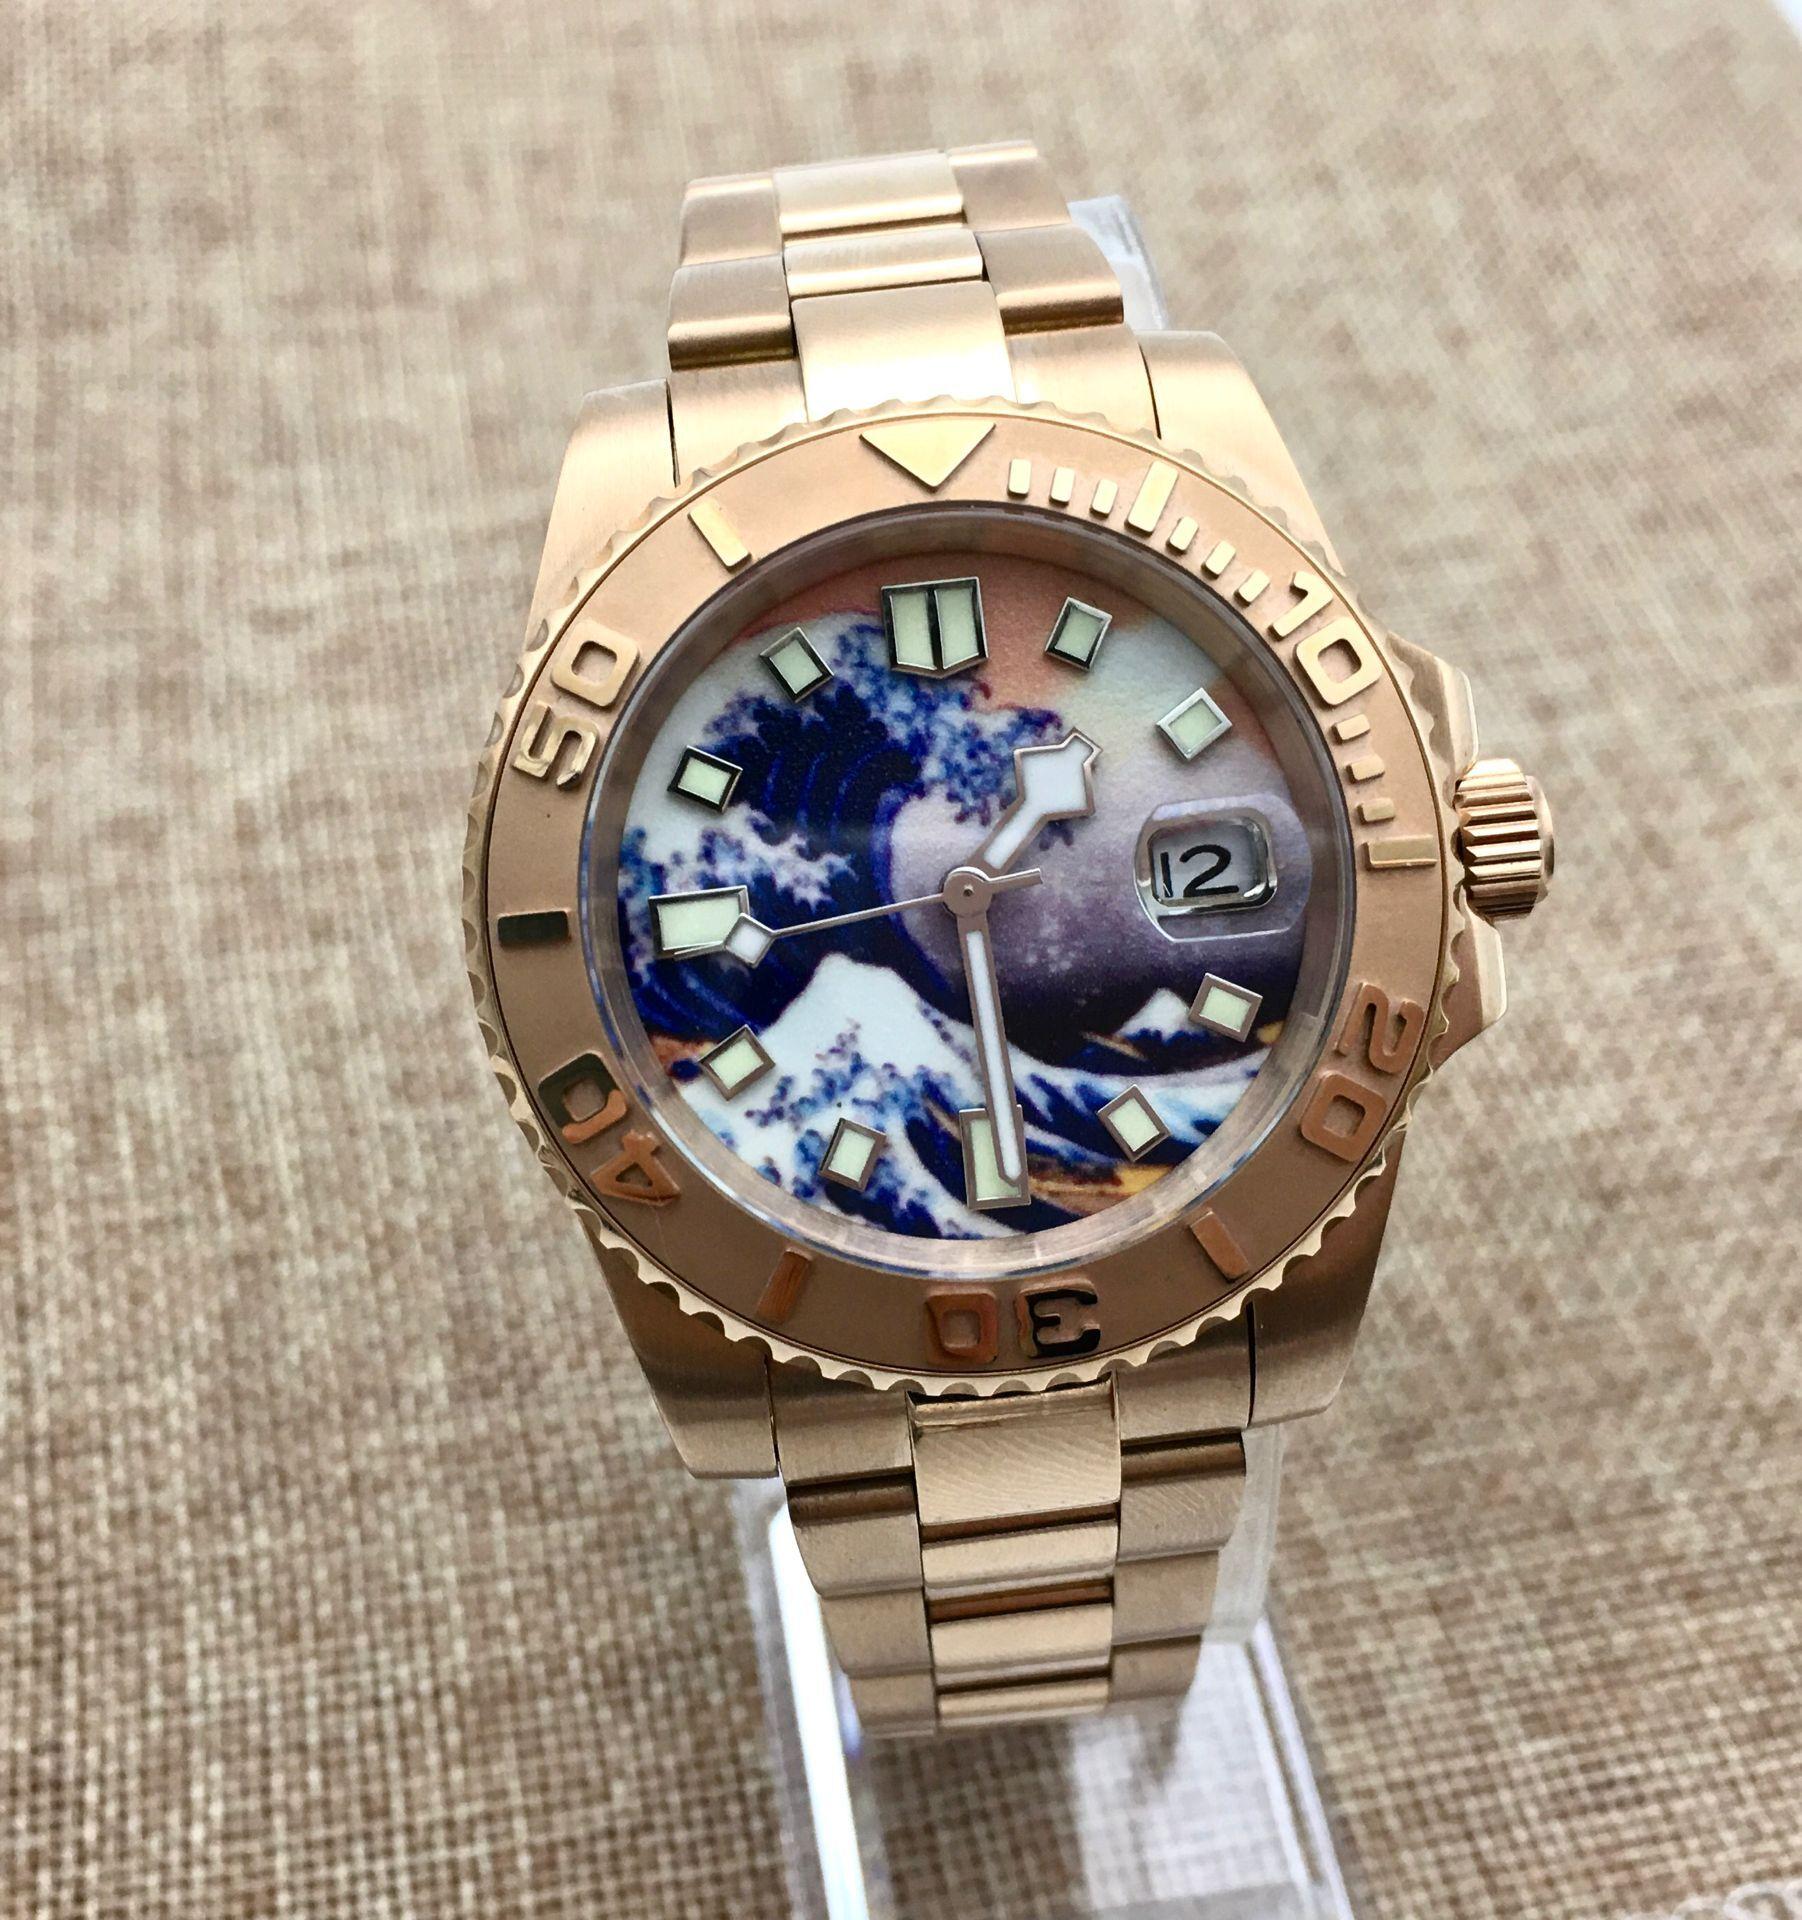 40mm Kanagawa Surf Luminous Dial Ceramic Ring Yacht Men's Automatic Mechanical Watch Stainless Steel Rose Gold Case